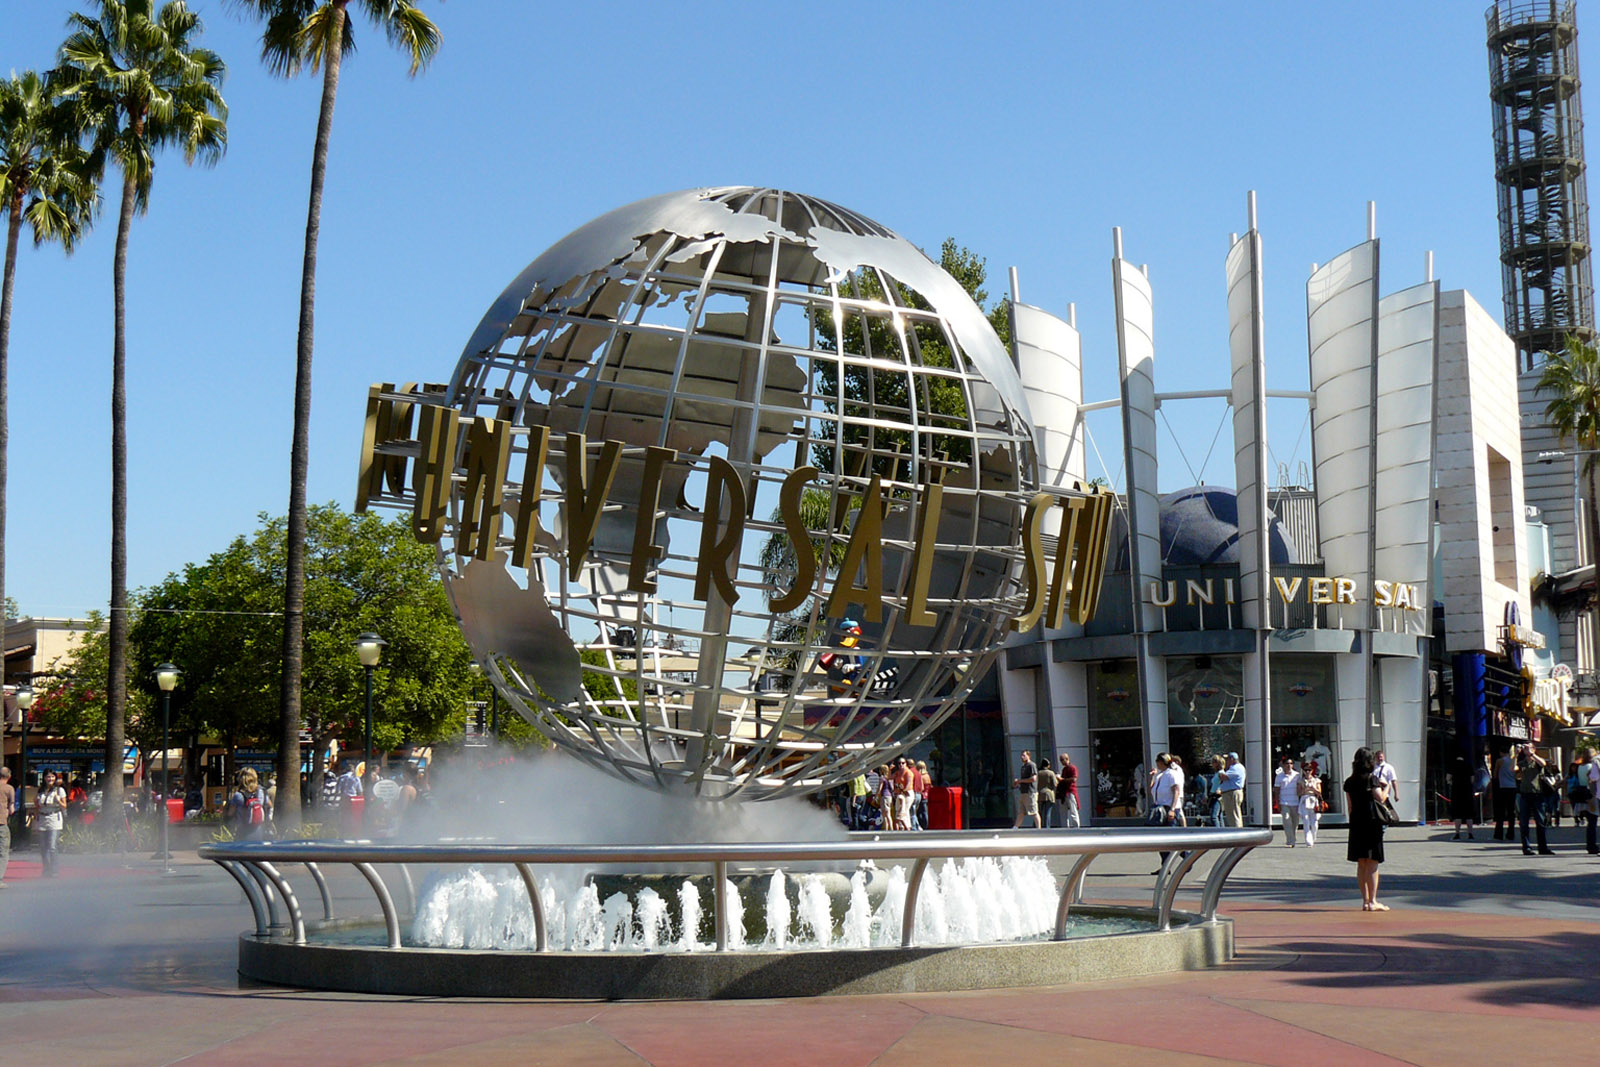 Universal Studios Hollywood — Theme Park Review - YouTravel.com.au